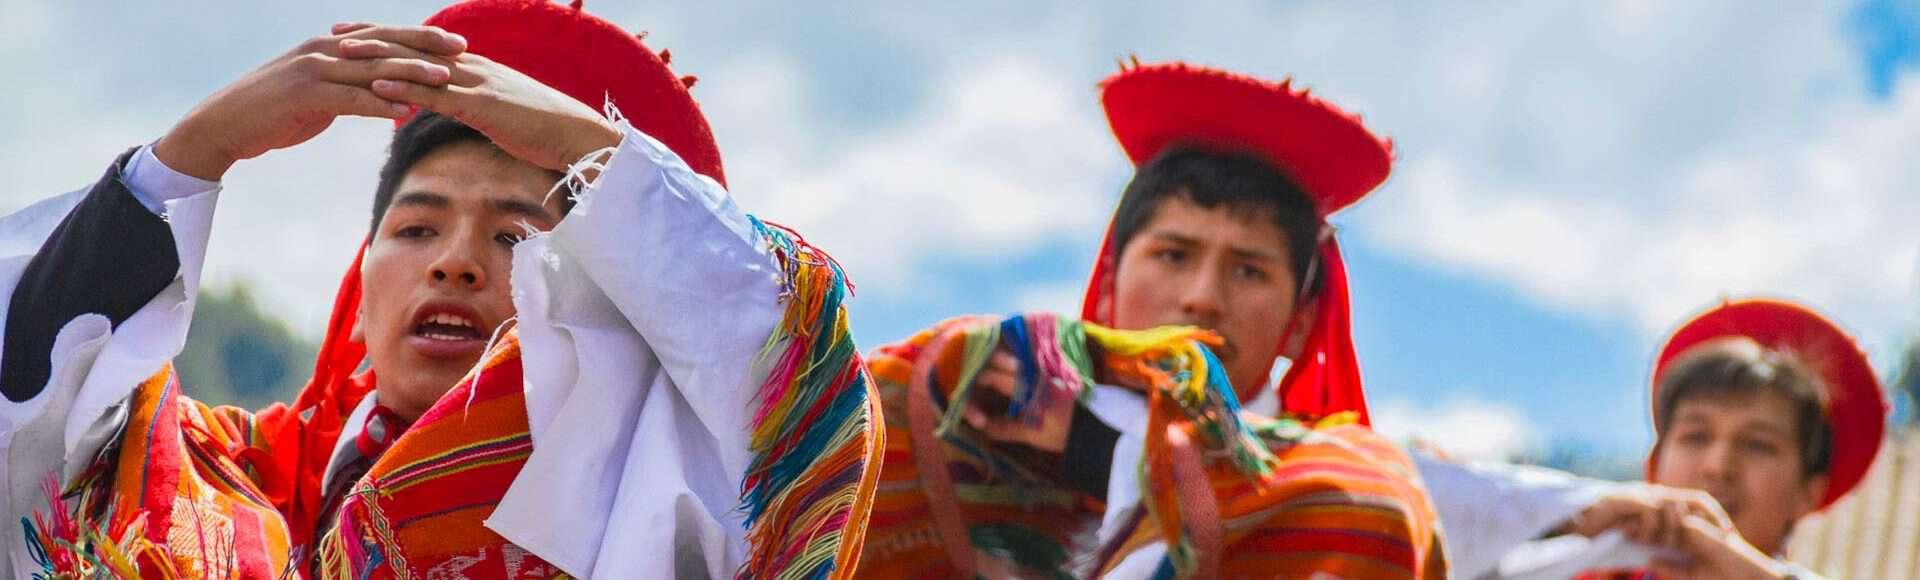 Festividades, Fiestas, tradicionales del Cusco   ILE Tours Peru